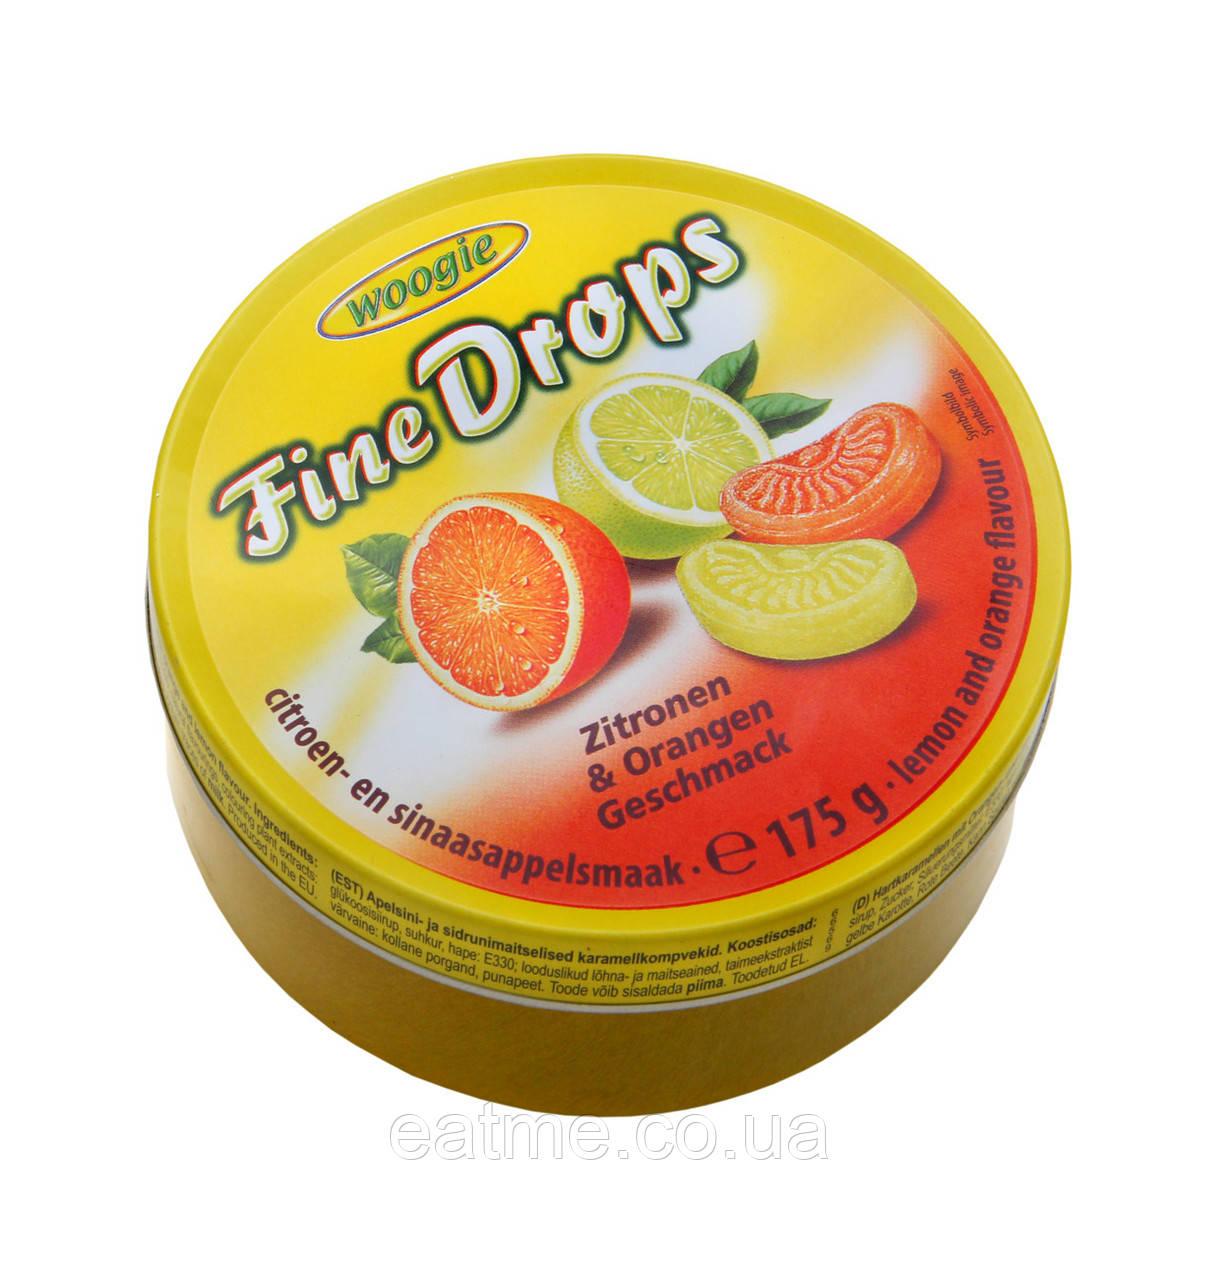 Woogie Fine Drops Леденцы со вкусом лимона и апельсина